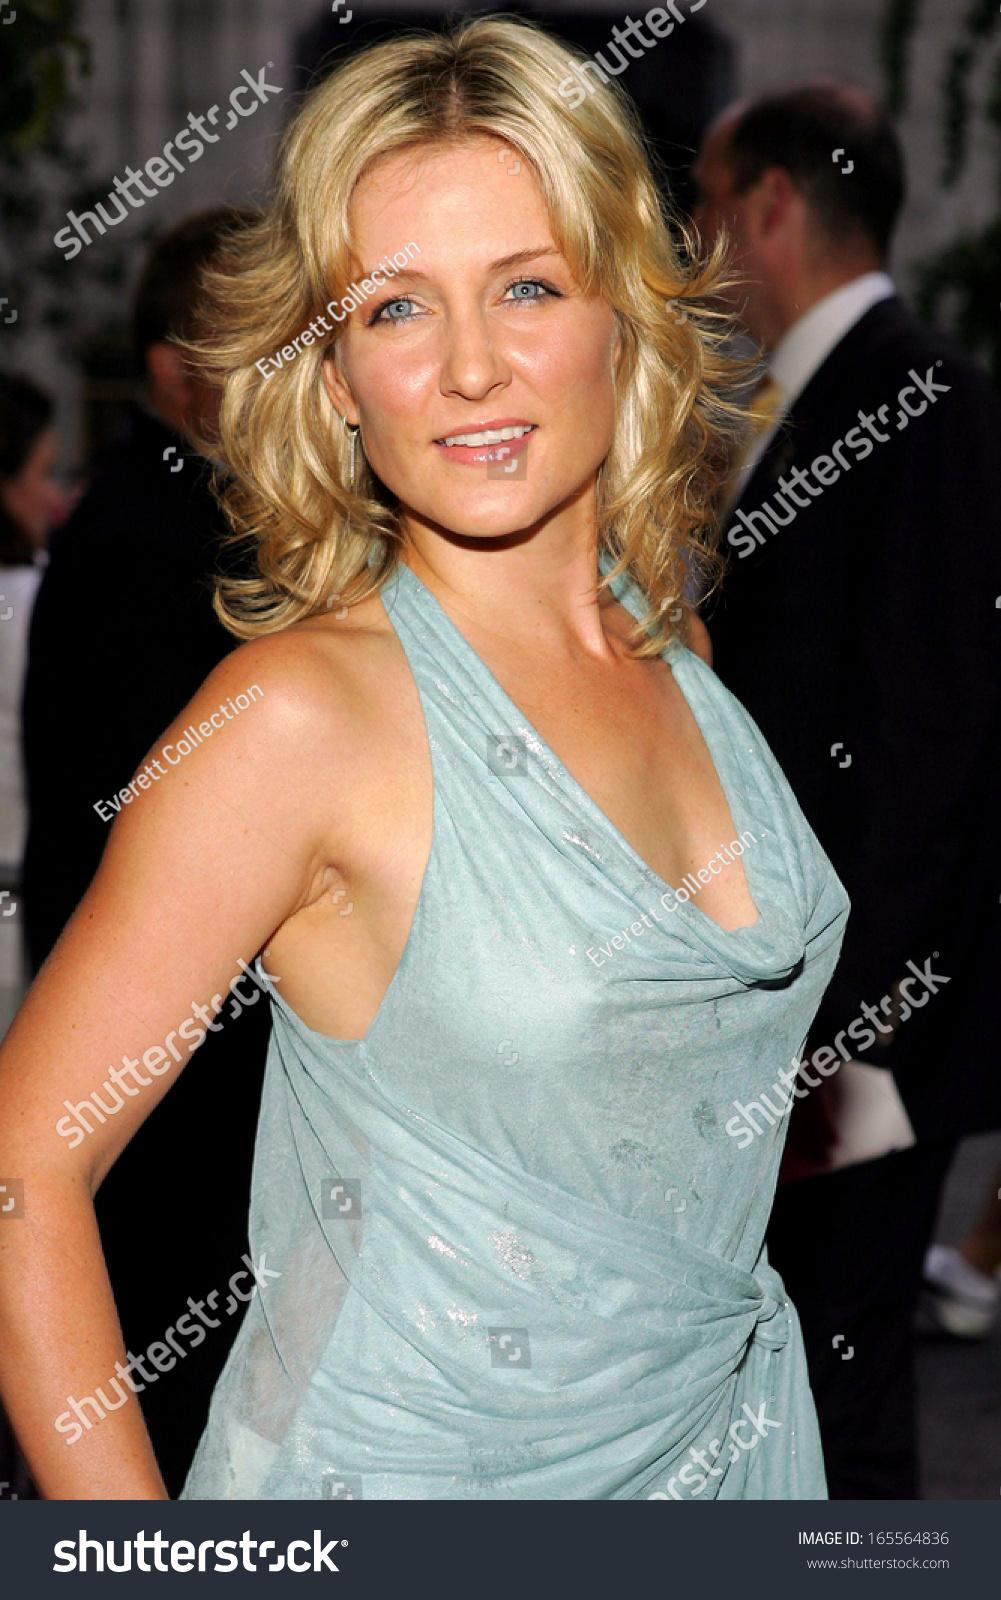 Amy Carlson Bilder amy carlson world premiere paramount pictures stockfoto